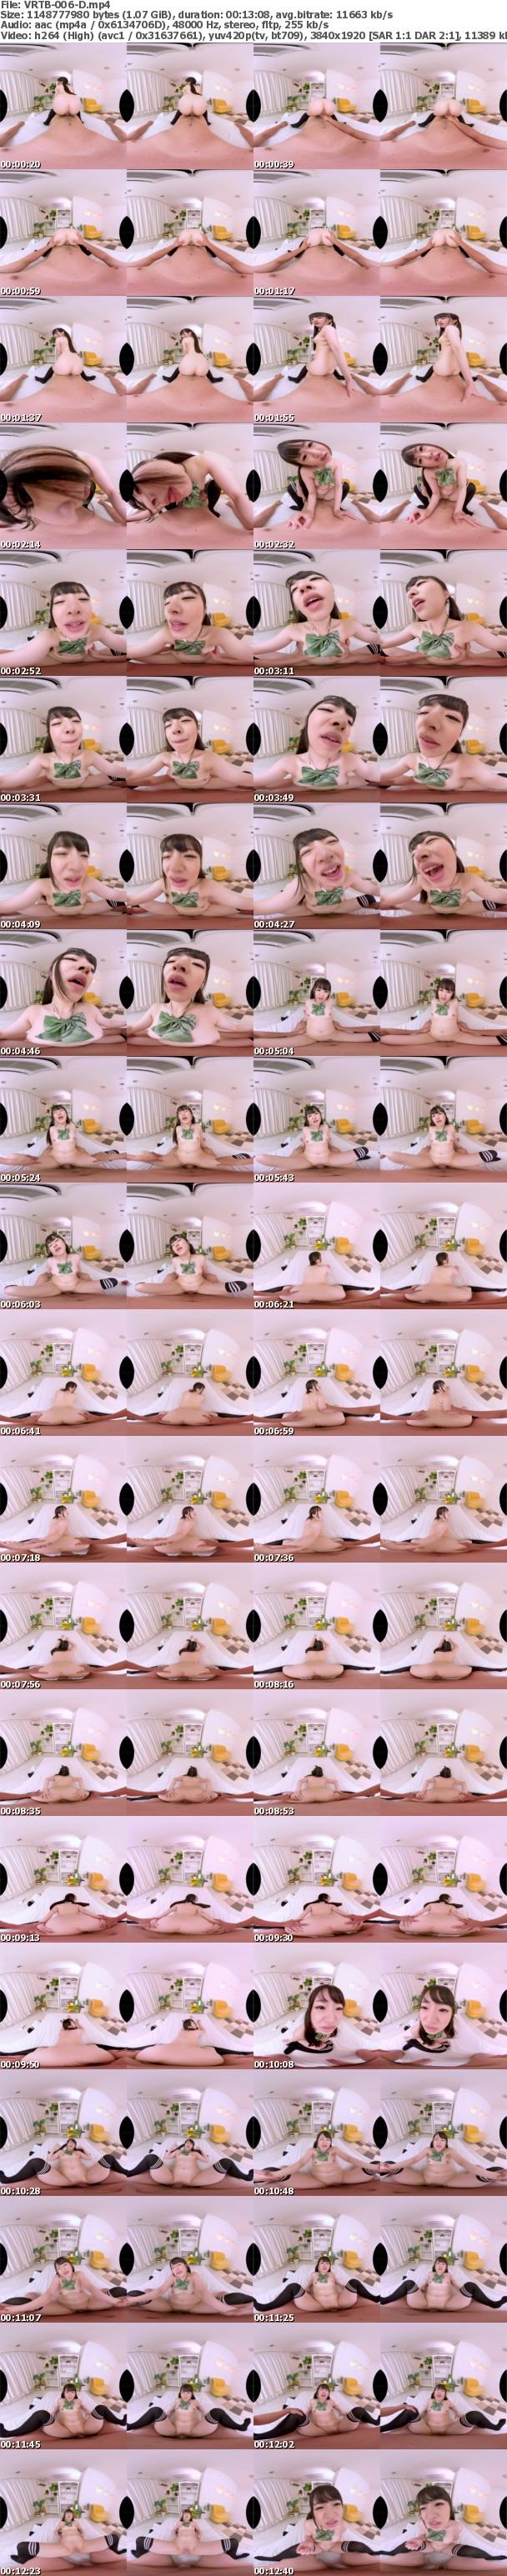 (VR) VRTB-006 THE BEST OF 3DVR 新人限定ベロチュウ舐めまくり制服リフレ TWIN PACK(ツインパック)桃尻かのん 八尋麻衣